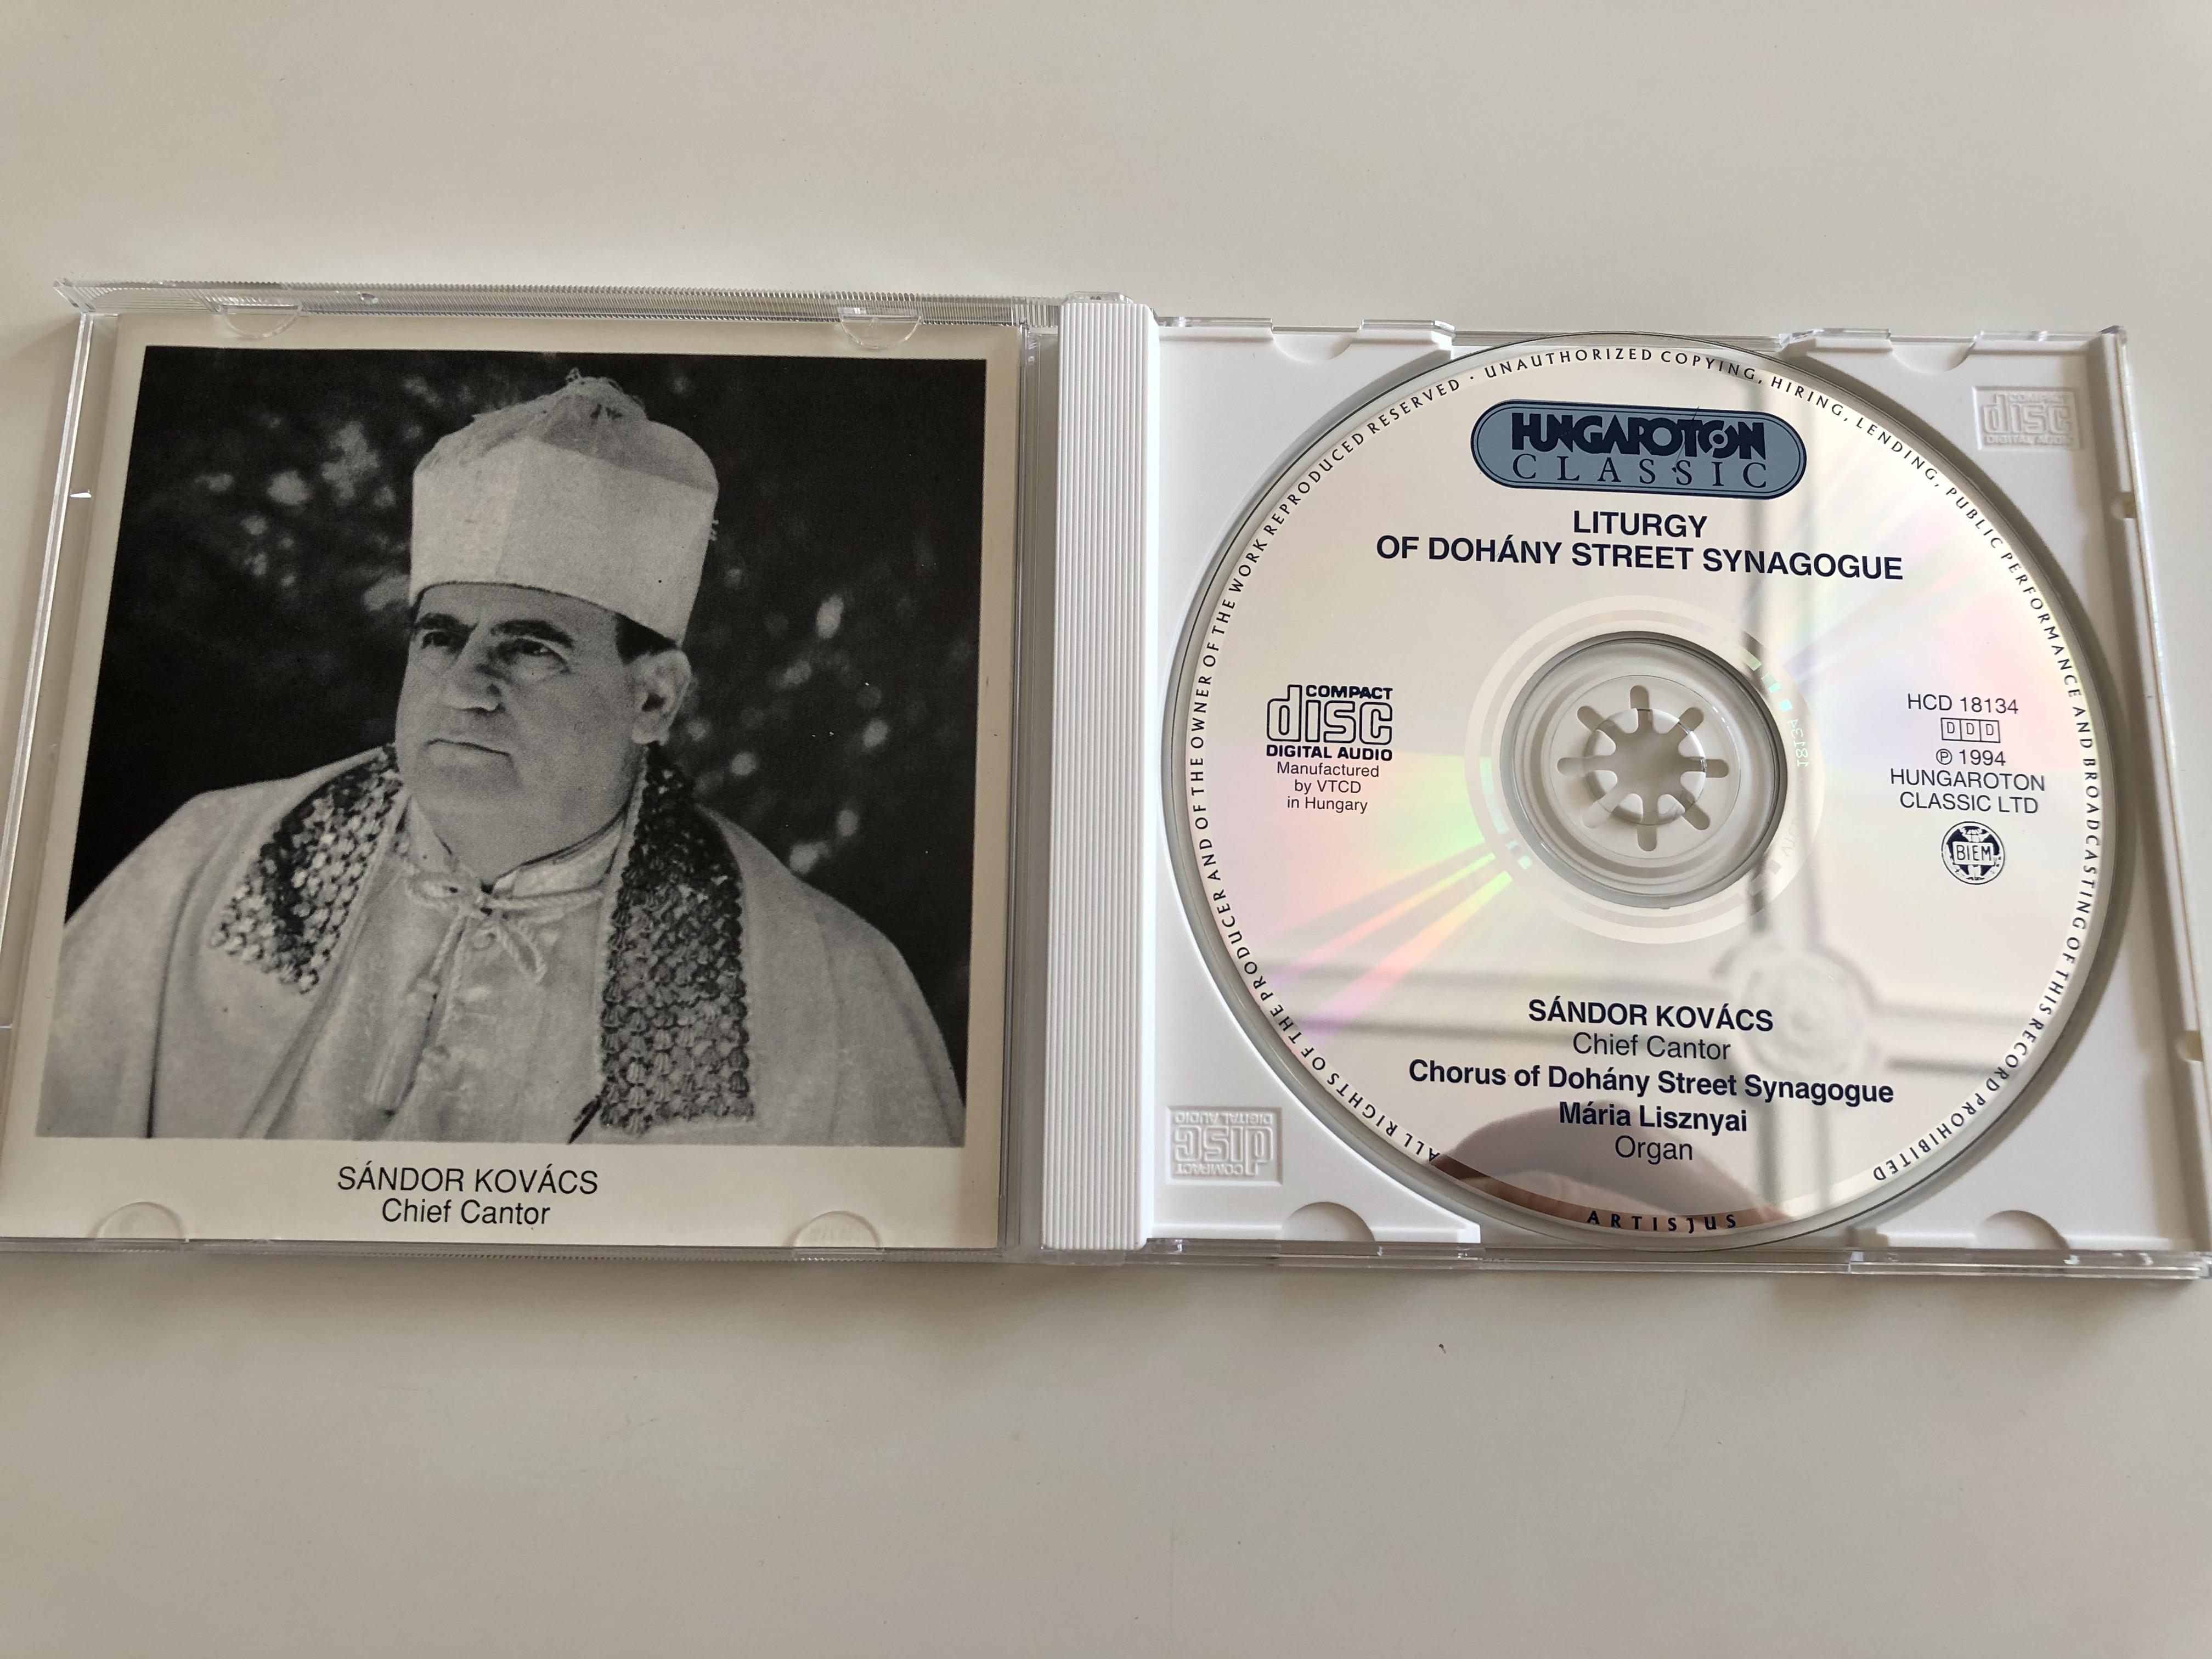 liturgy-of-doh-ny-street-synagogue-s-ndor-kov-cs-chief-cantor-hungaroton-classic-audio-cd-1994-hcd-18134-4-.jpg